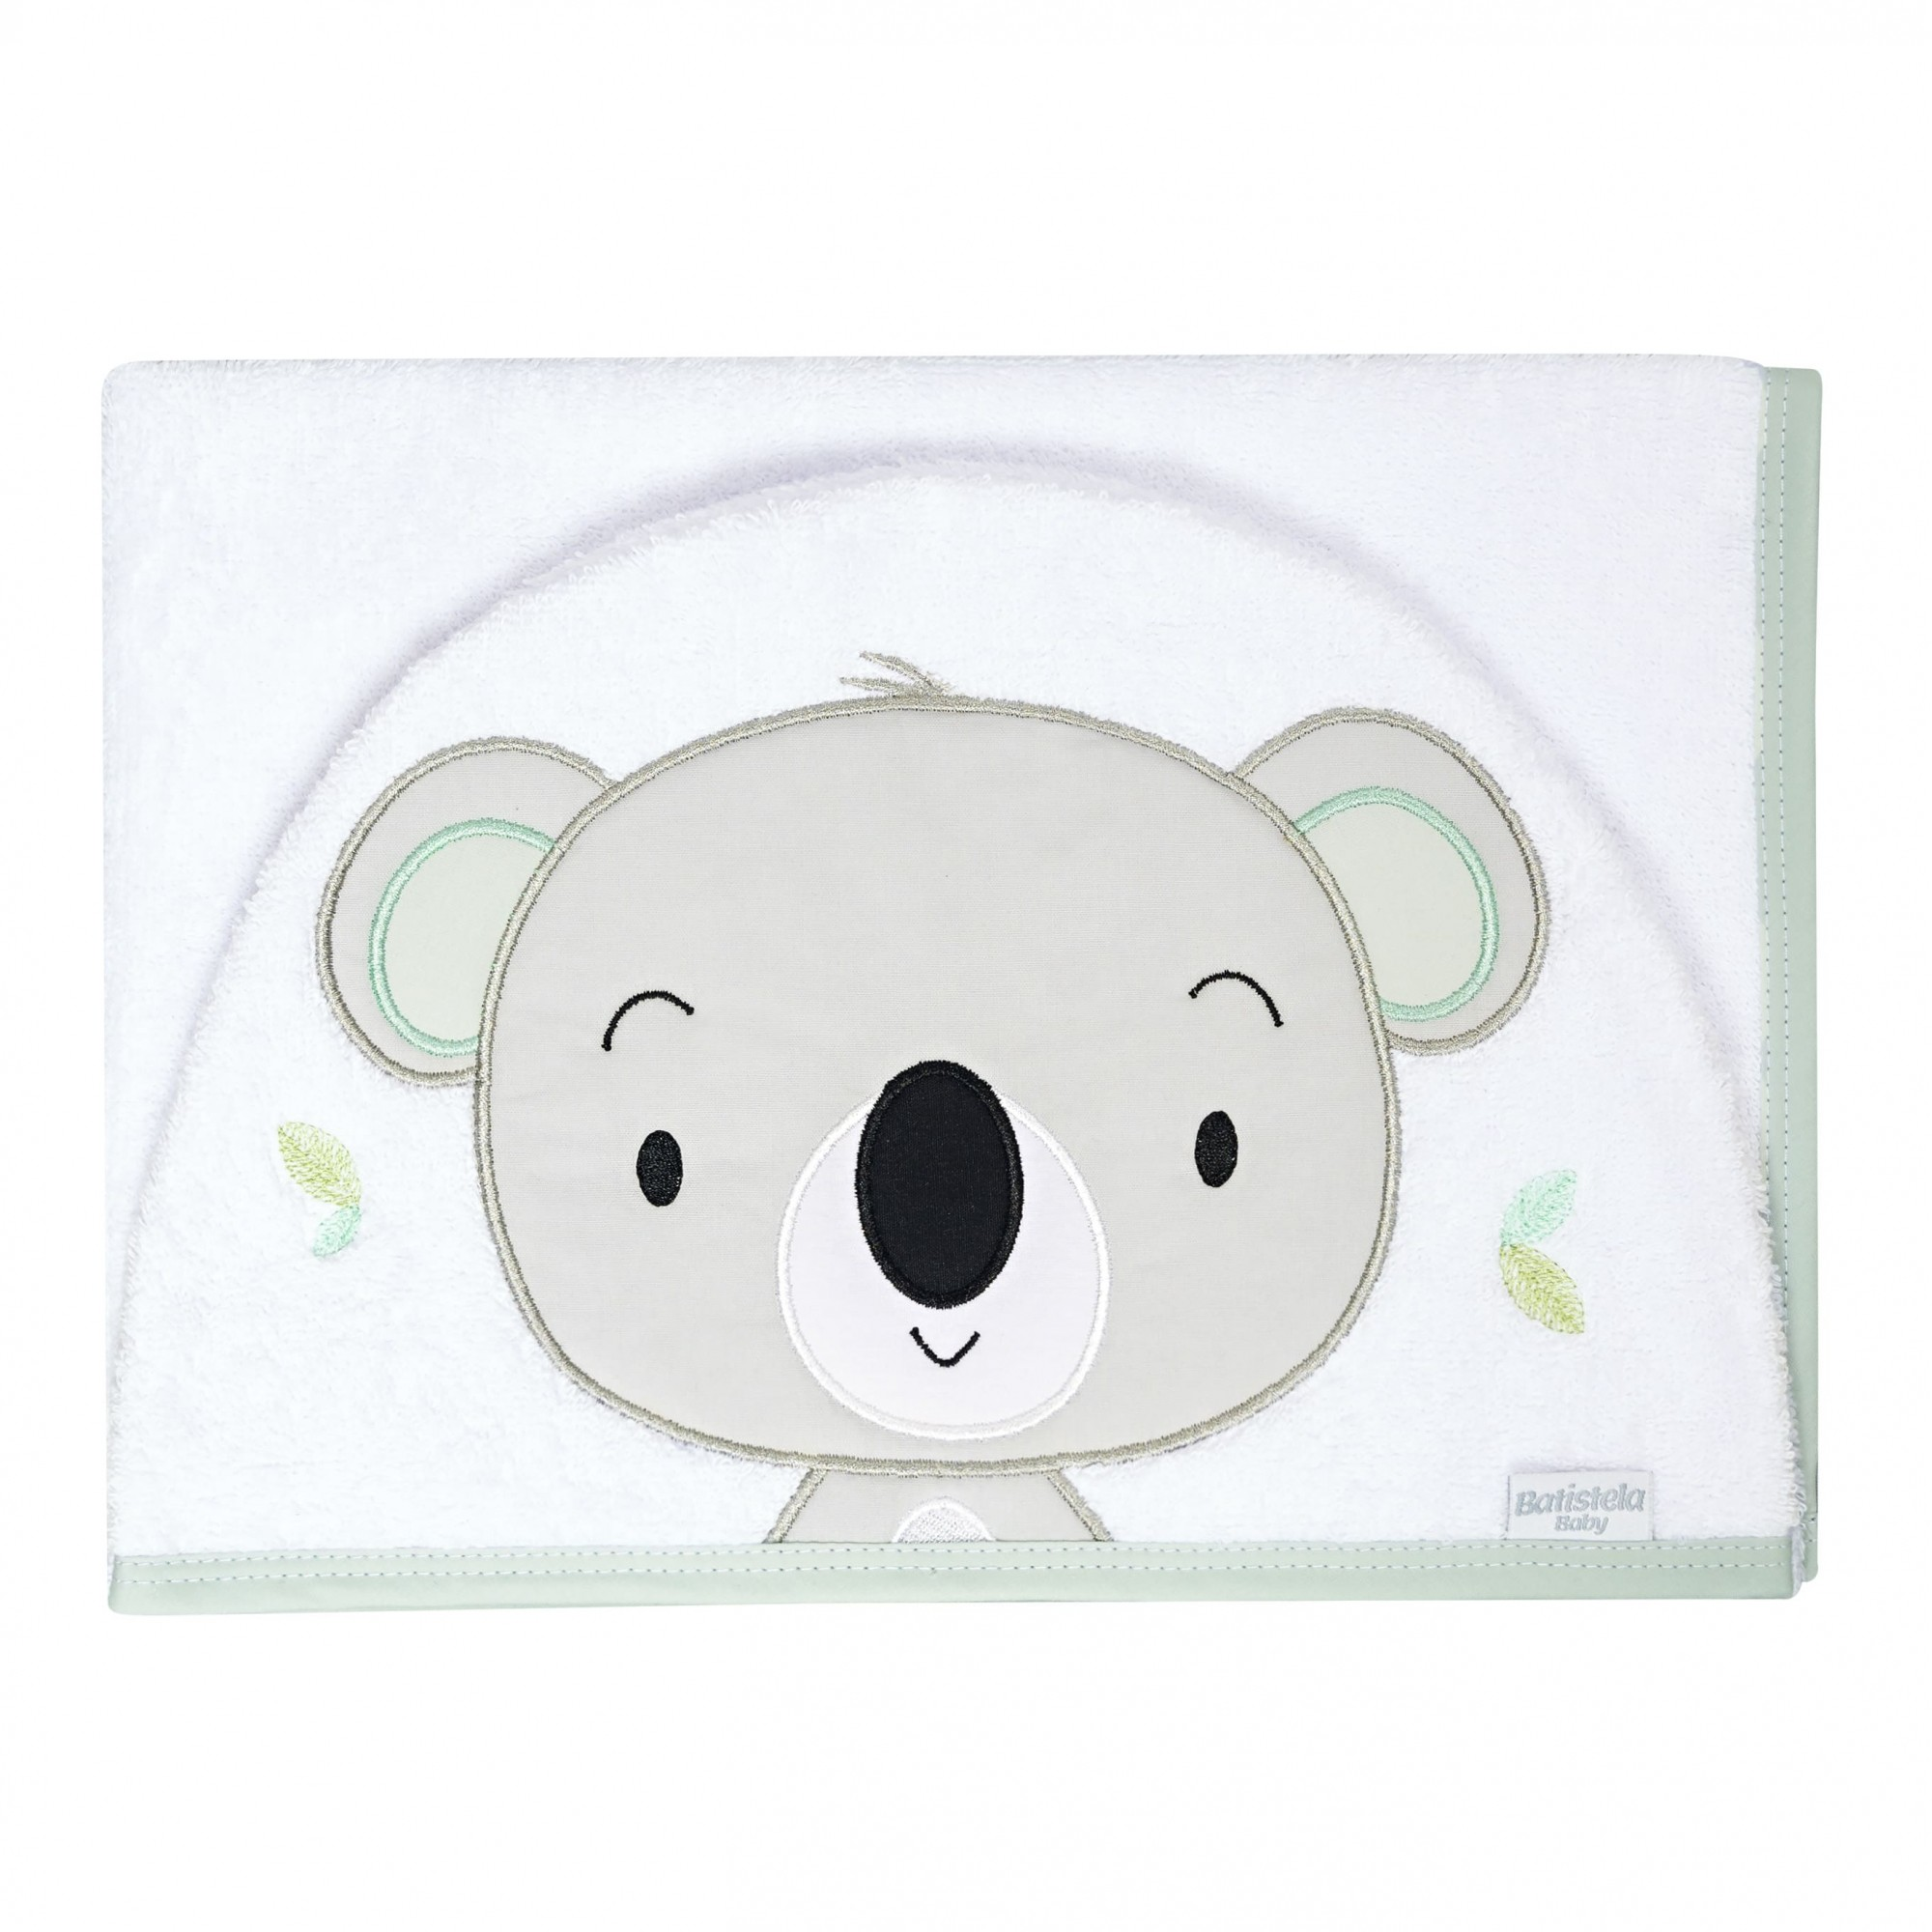 Toalha de Banho Bichinhos - Coala Batistela Baby